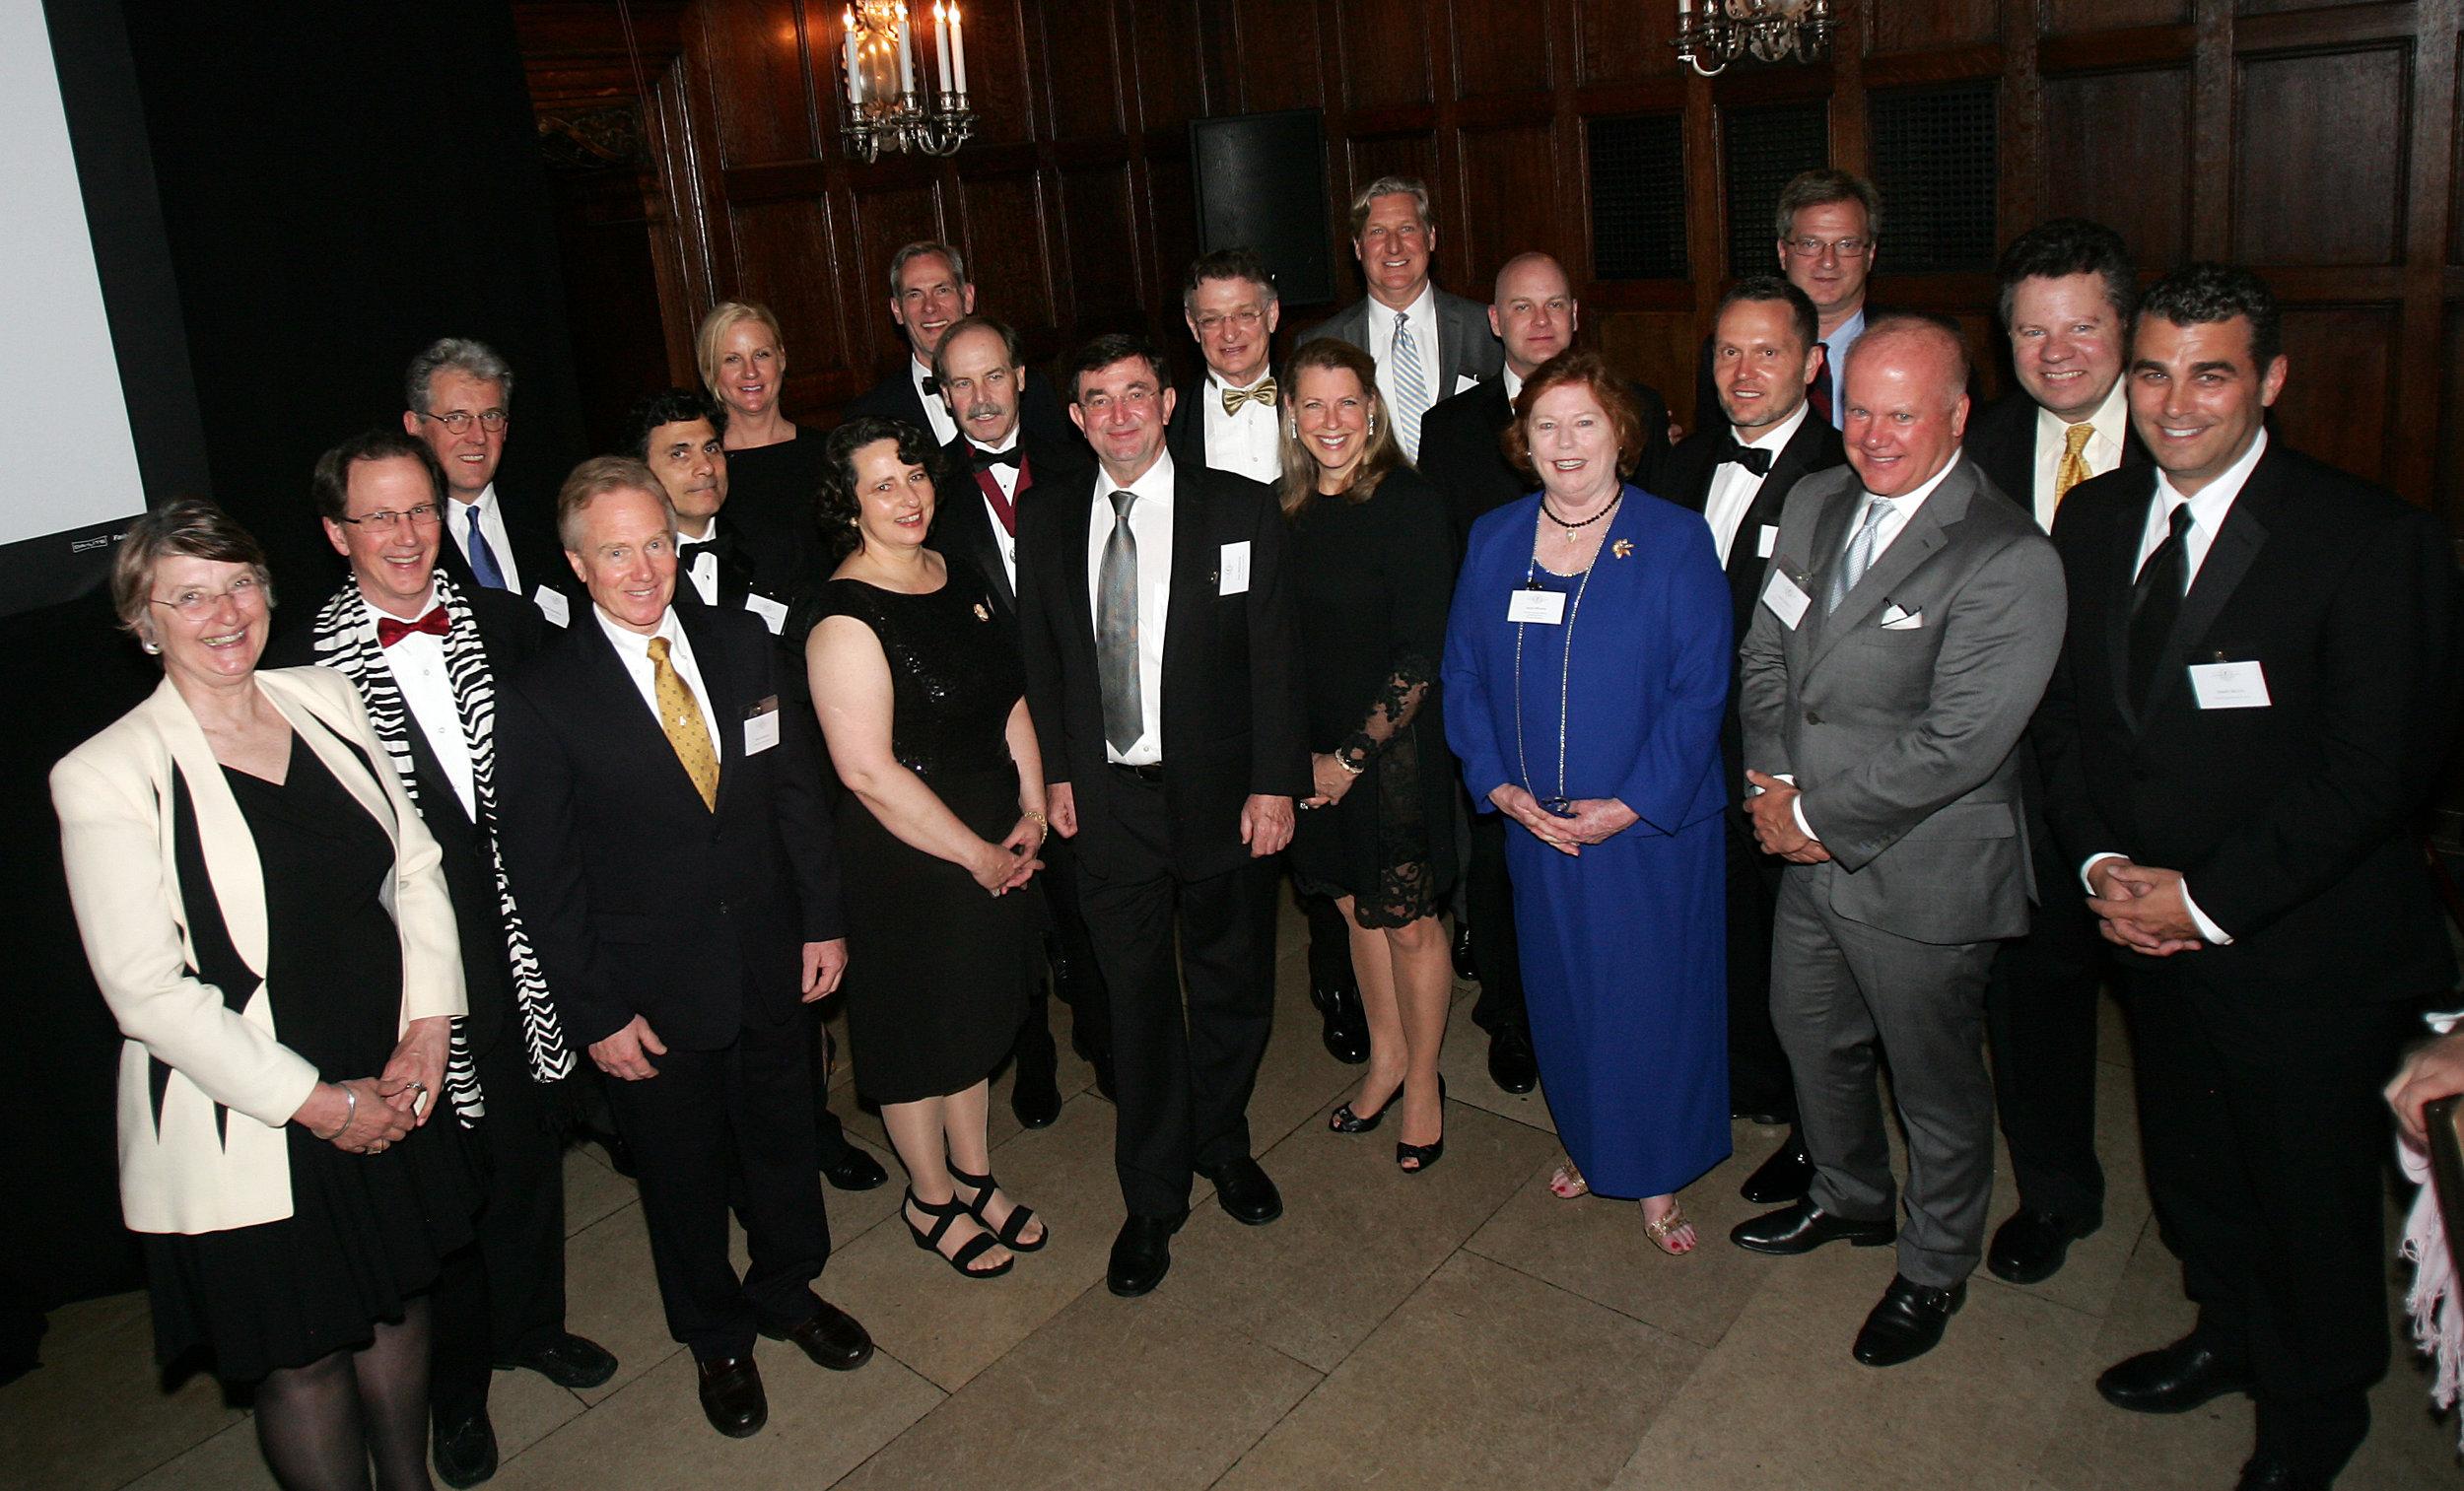 Past Bulfinch Award winners